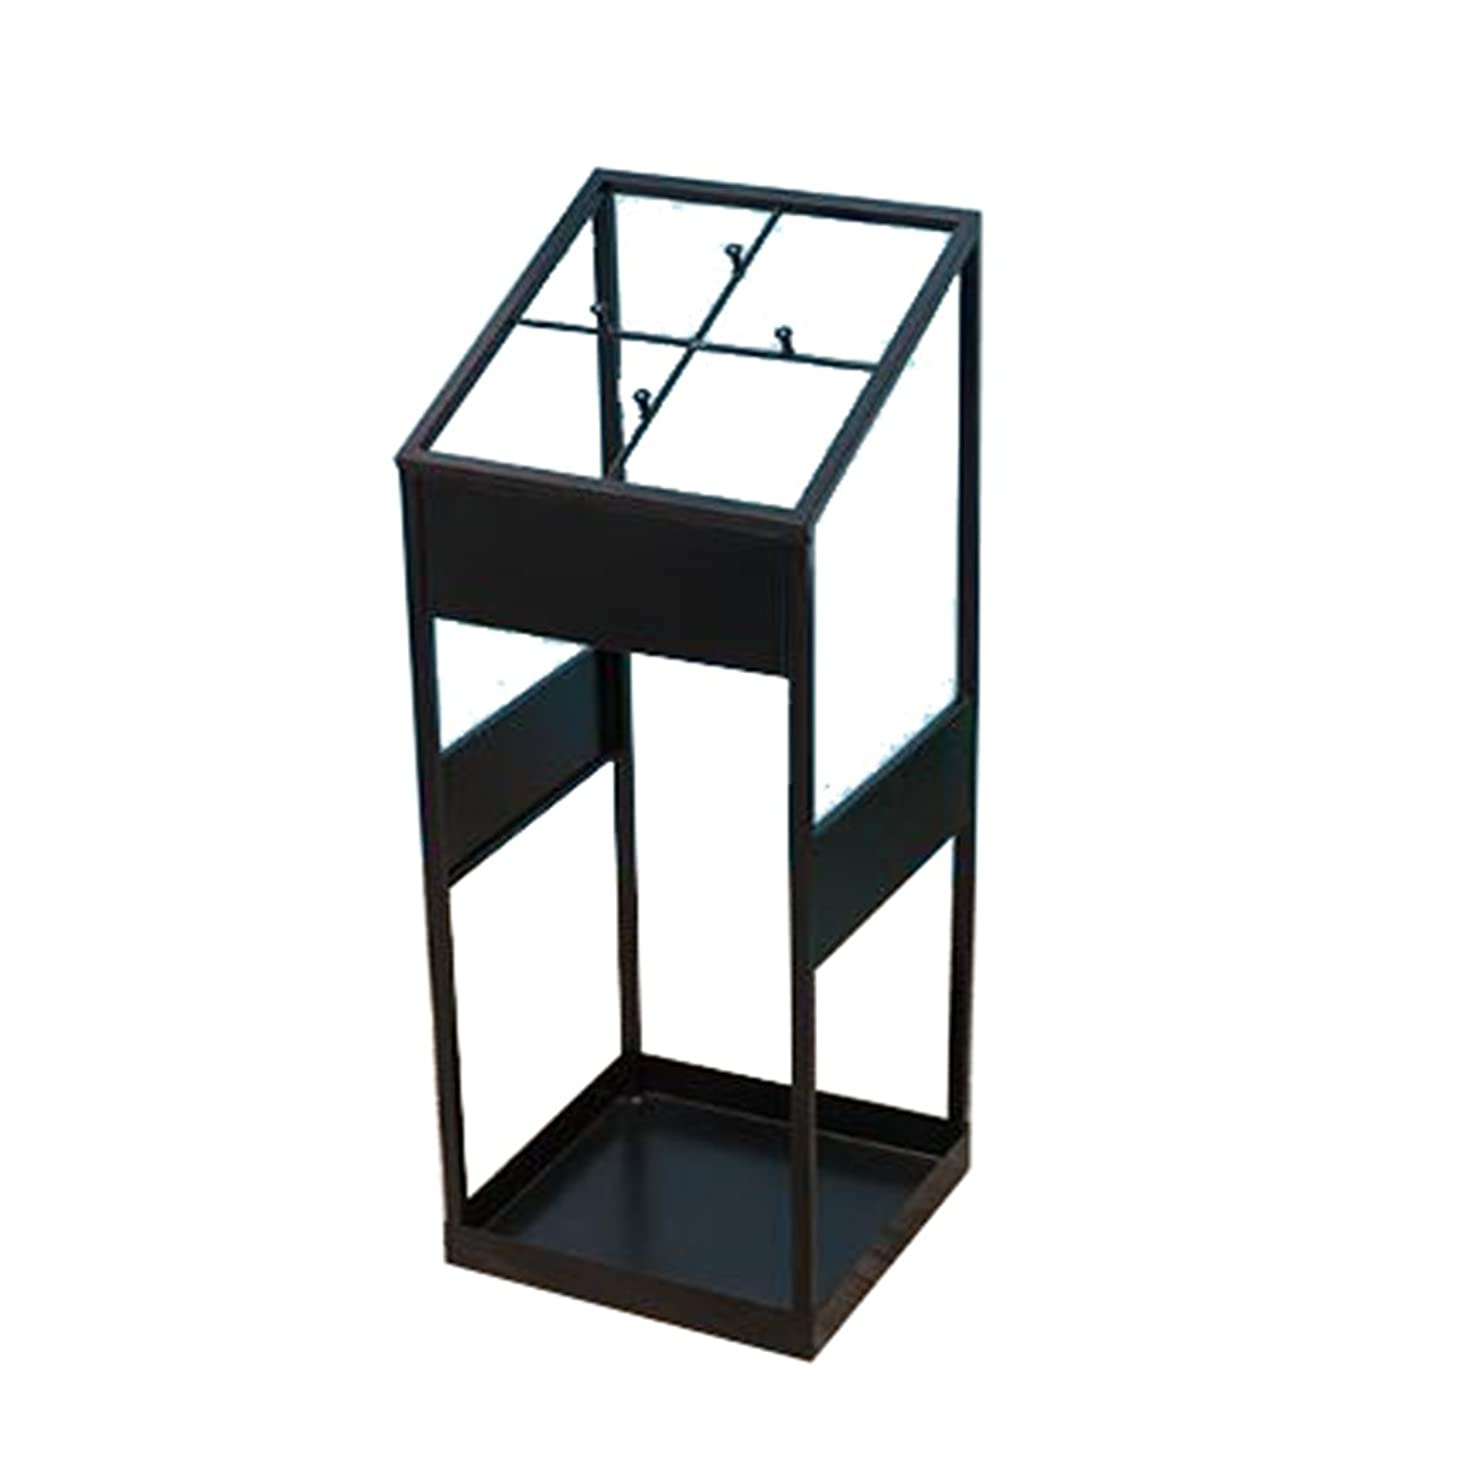 Rack Shelf Fashion Umbrella Pail Wrought Iron Umbrella Stand Storage Umbrella Stand Umbrella Tube 27cm27cm62cm (Color : Black)